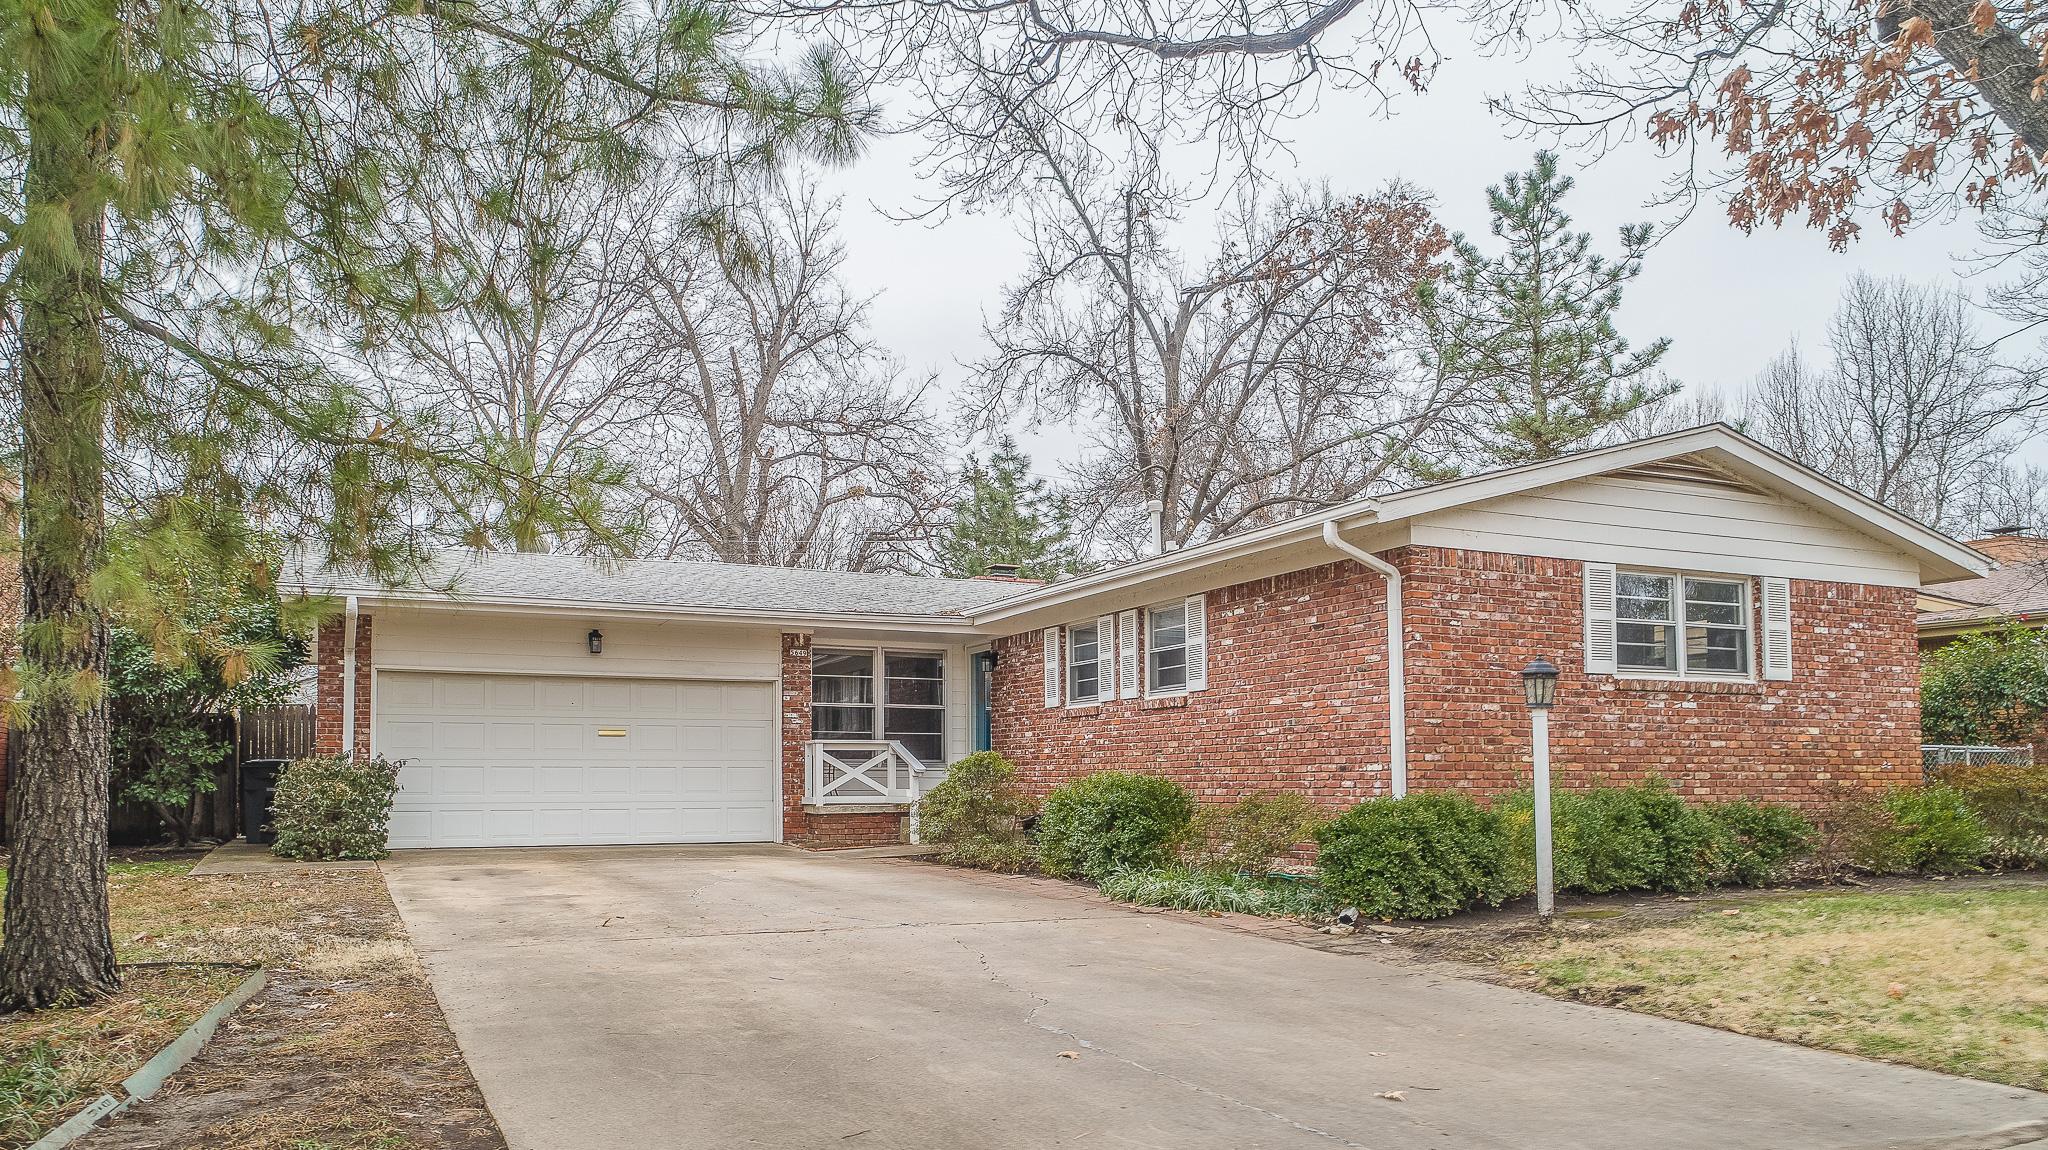 5649 S Yorktown Pl - Tulsa, OK - $174,000 - SOLD